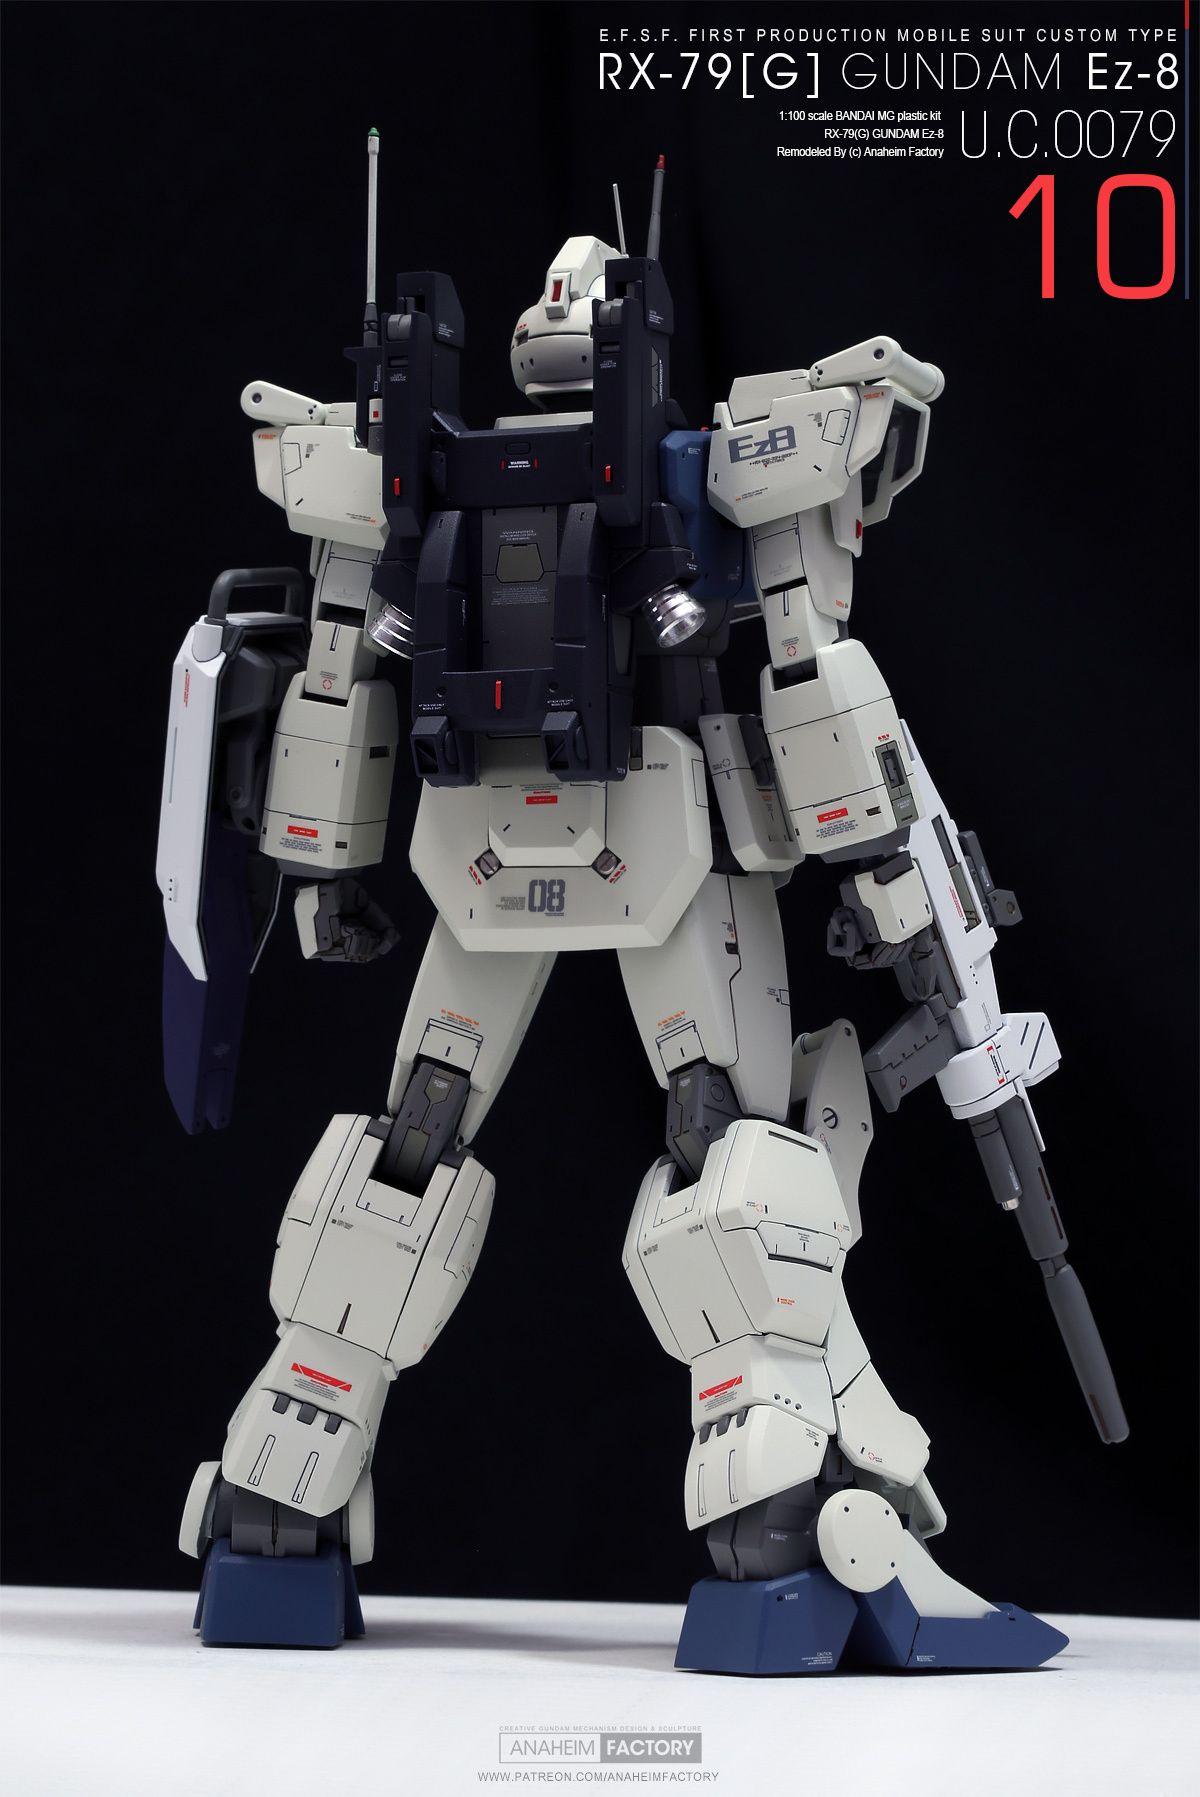 10 [ROLL OUT] RX79[G] GUNDAM Ez8